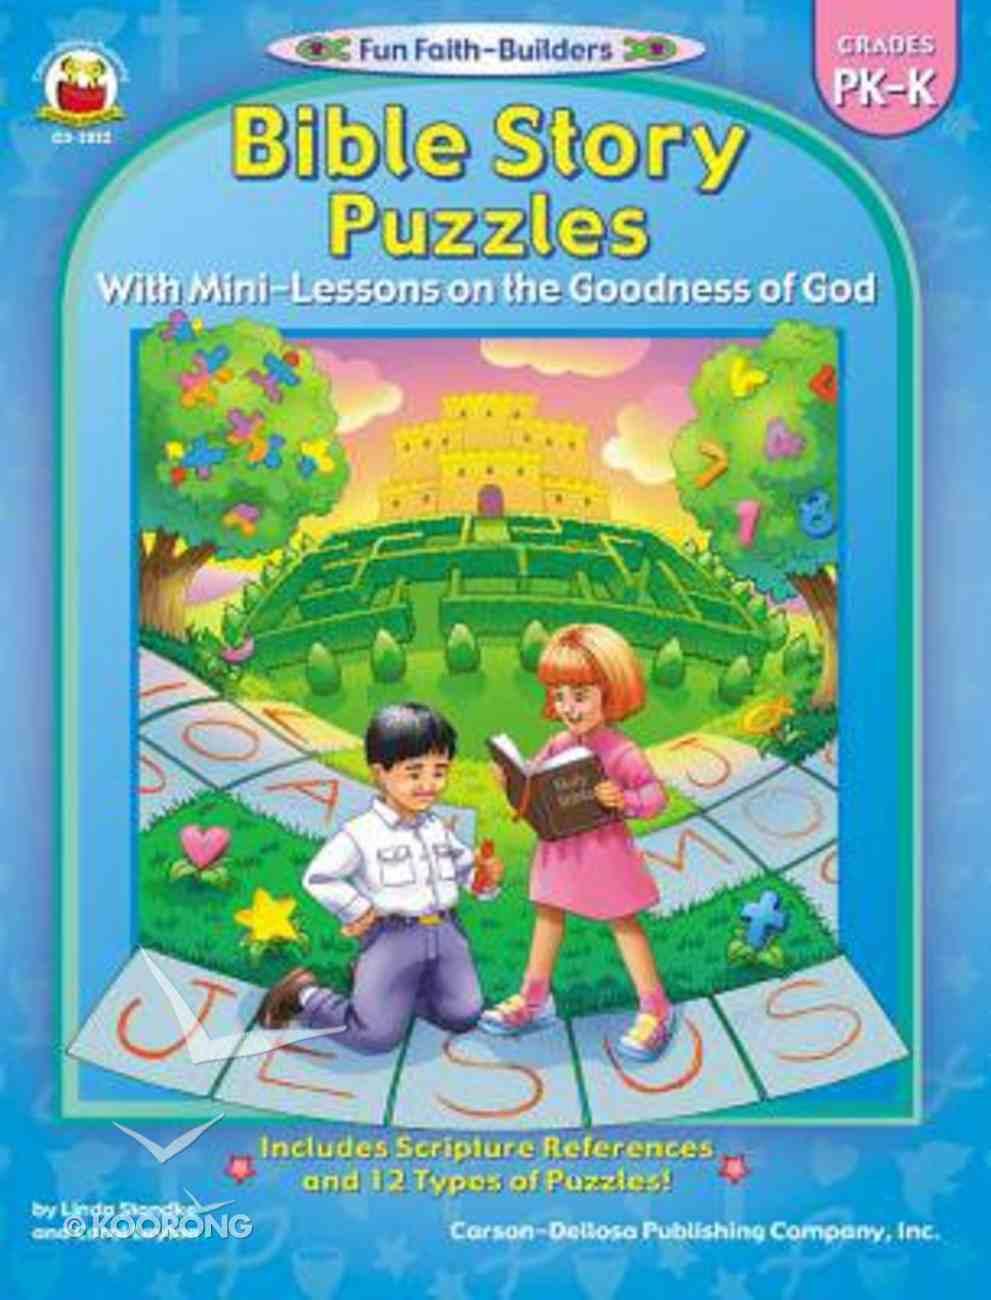 Bible Story Puzzles (Reproducible; Grades Pk-K) (Fun Faith-builders Series) Paperback